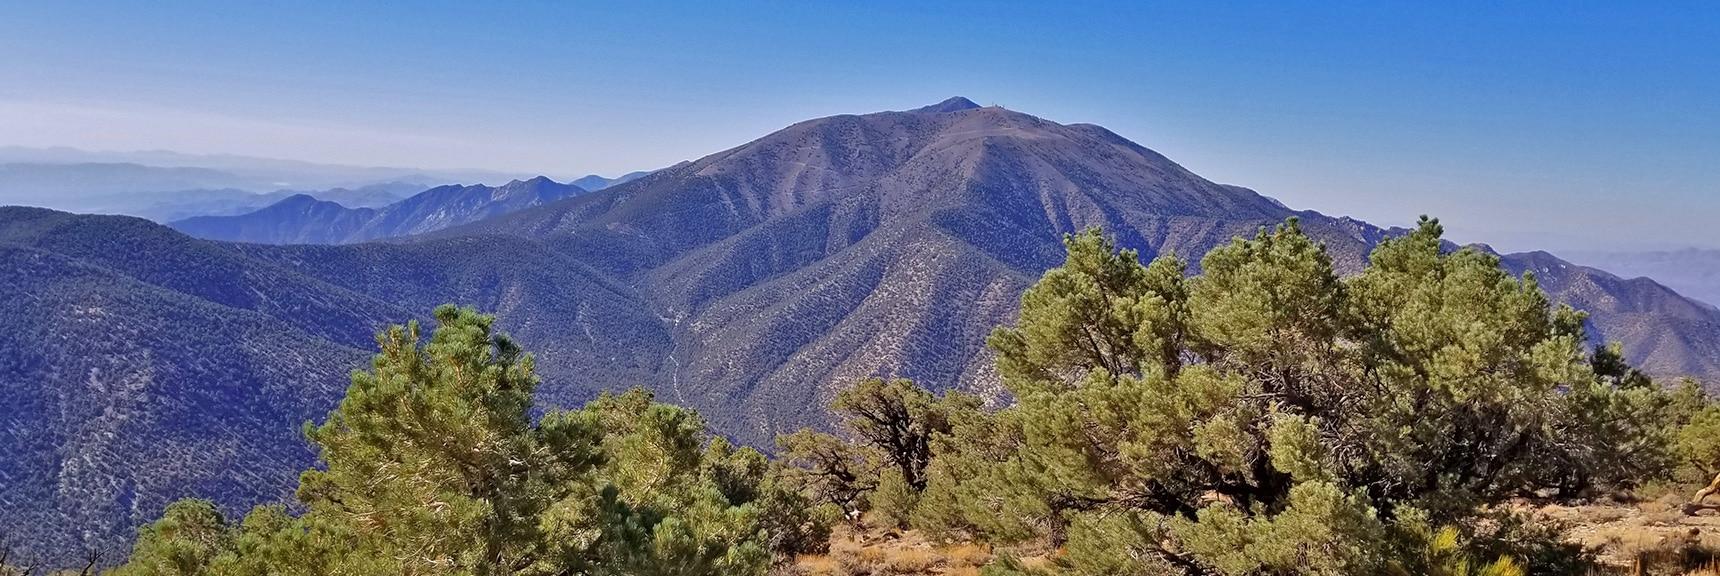 Telescope Peak, Bennett Peak and Rogers Peak from Near Wildrose Peak Summit   Wildrose Peak   Panamint Mountain Range   Death Valley National Park, California